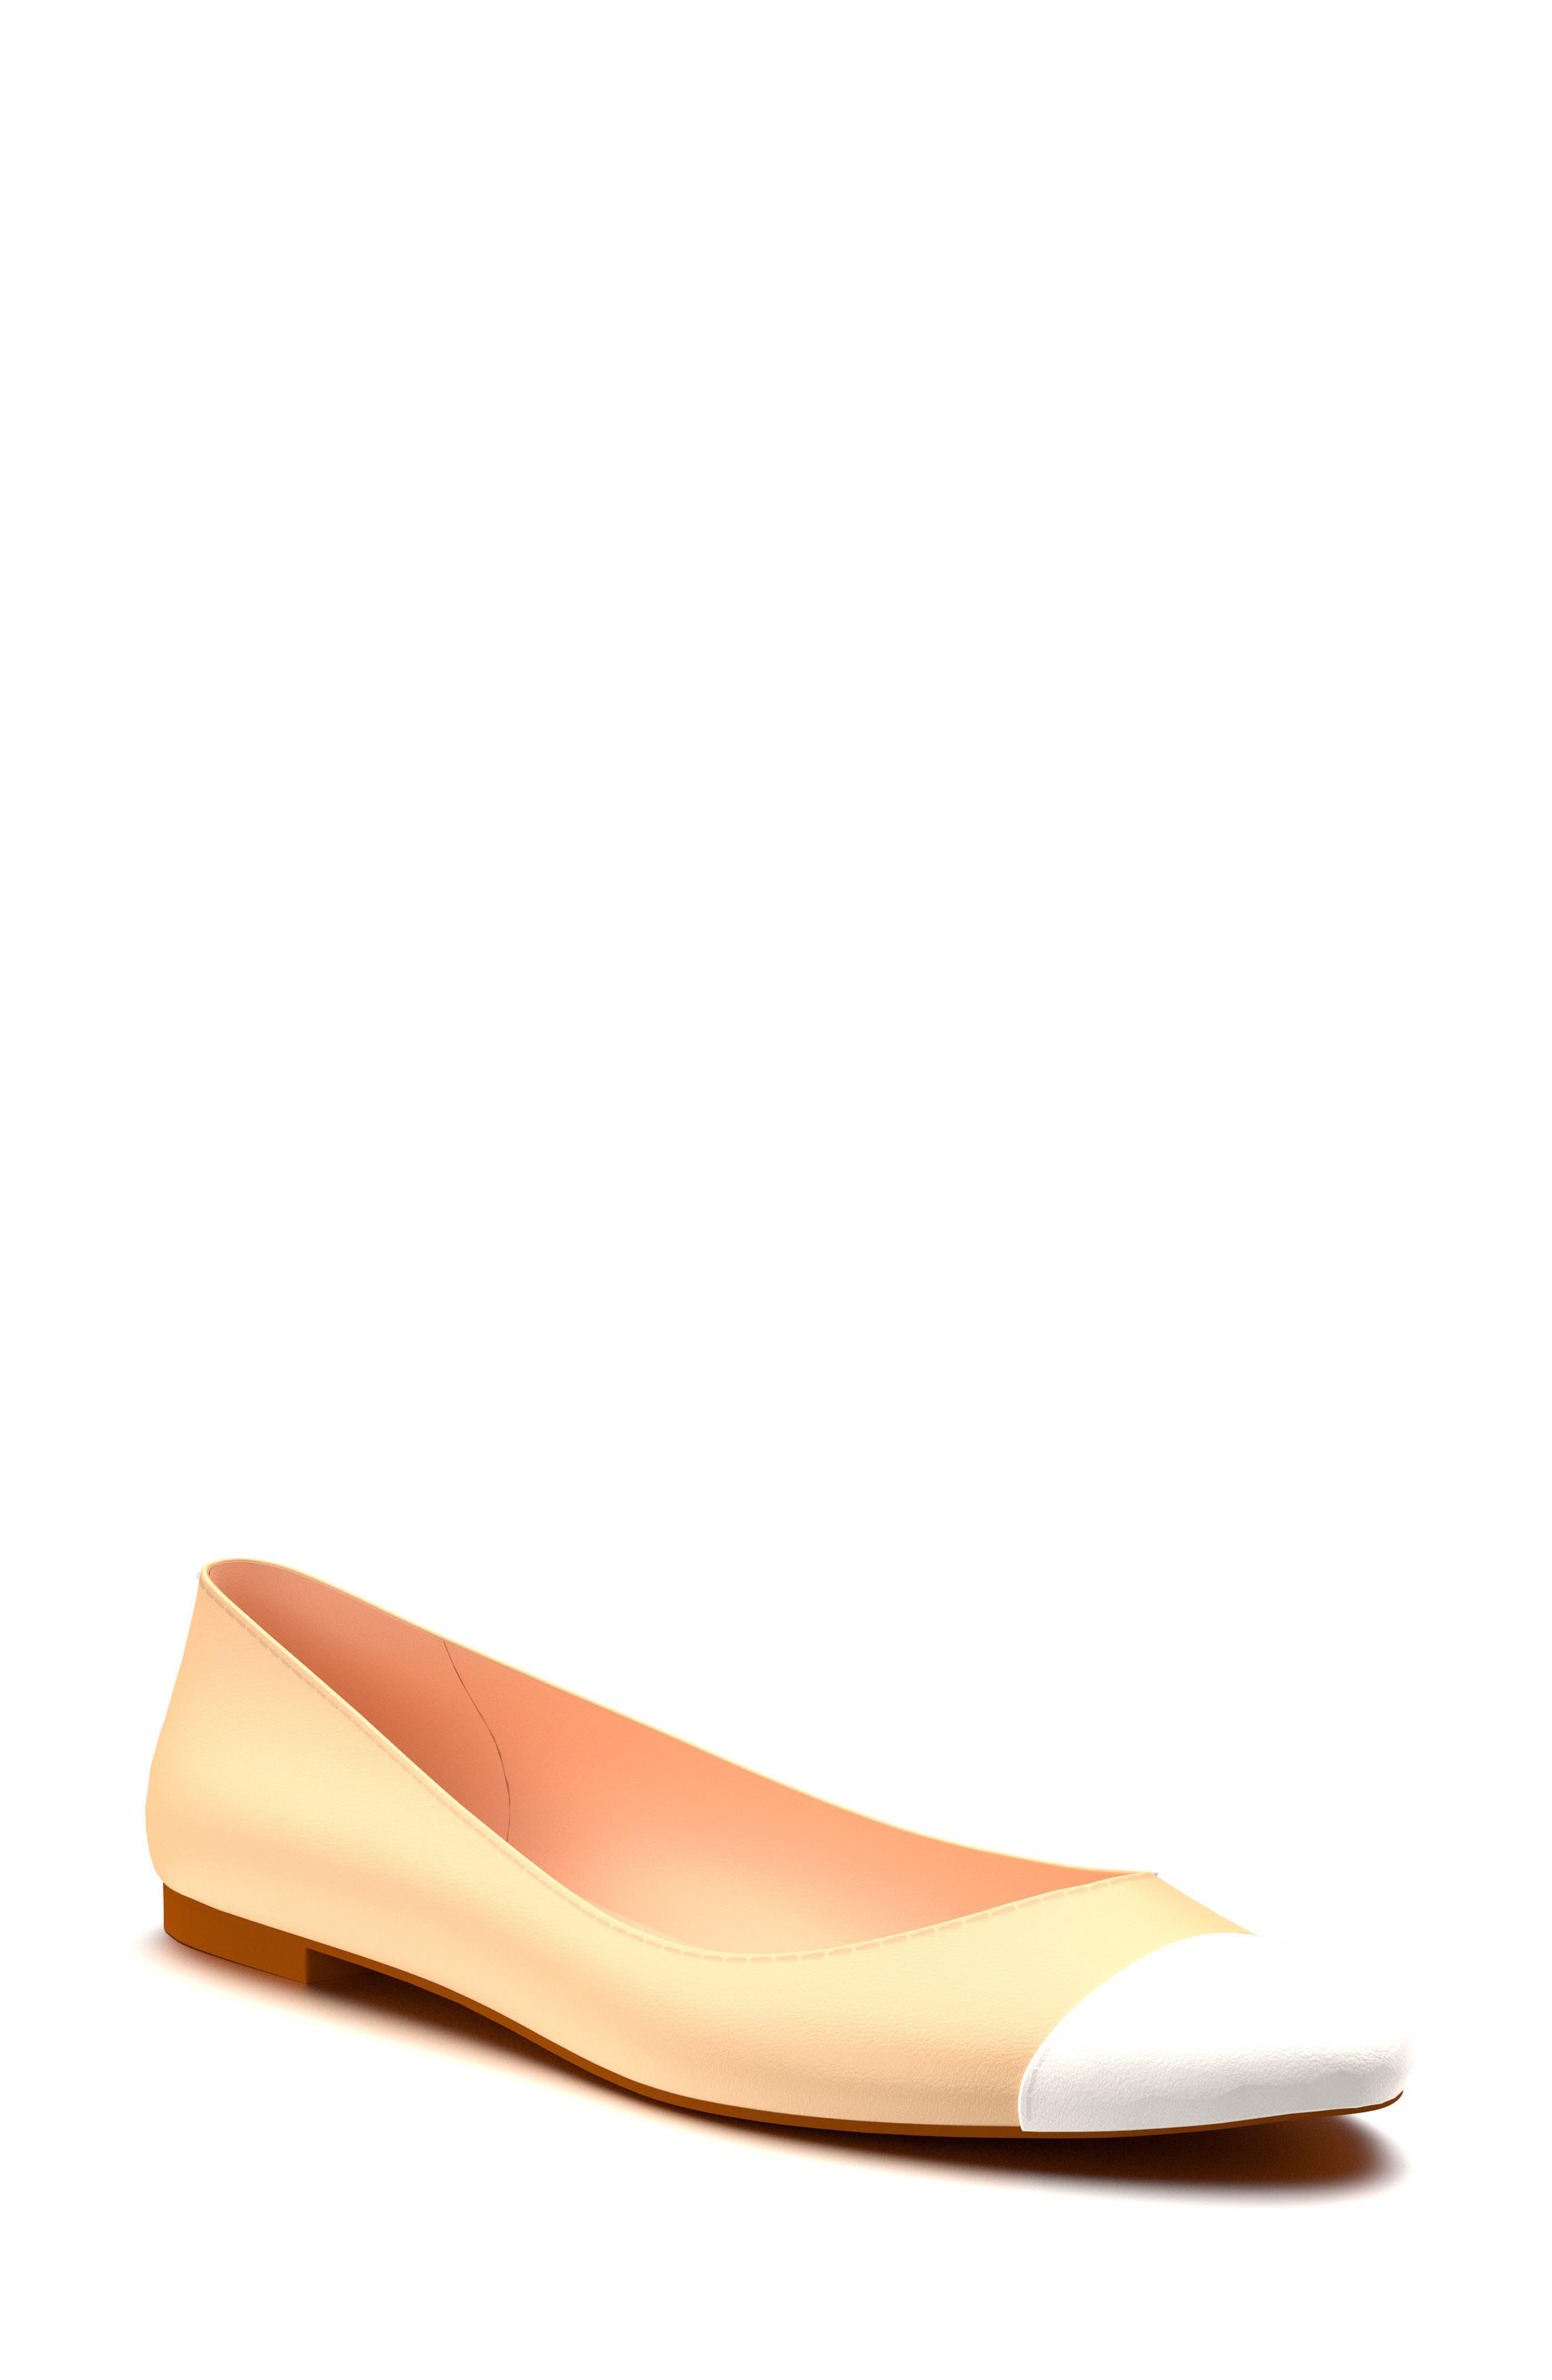 Alternate Image 1 Selected - Shoes of Prey Cap Toe Ballet Flat (Women)